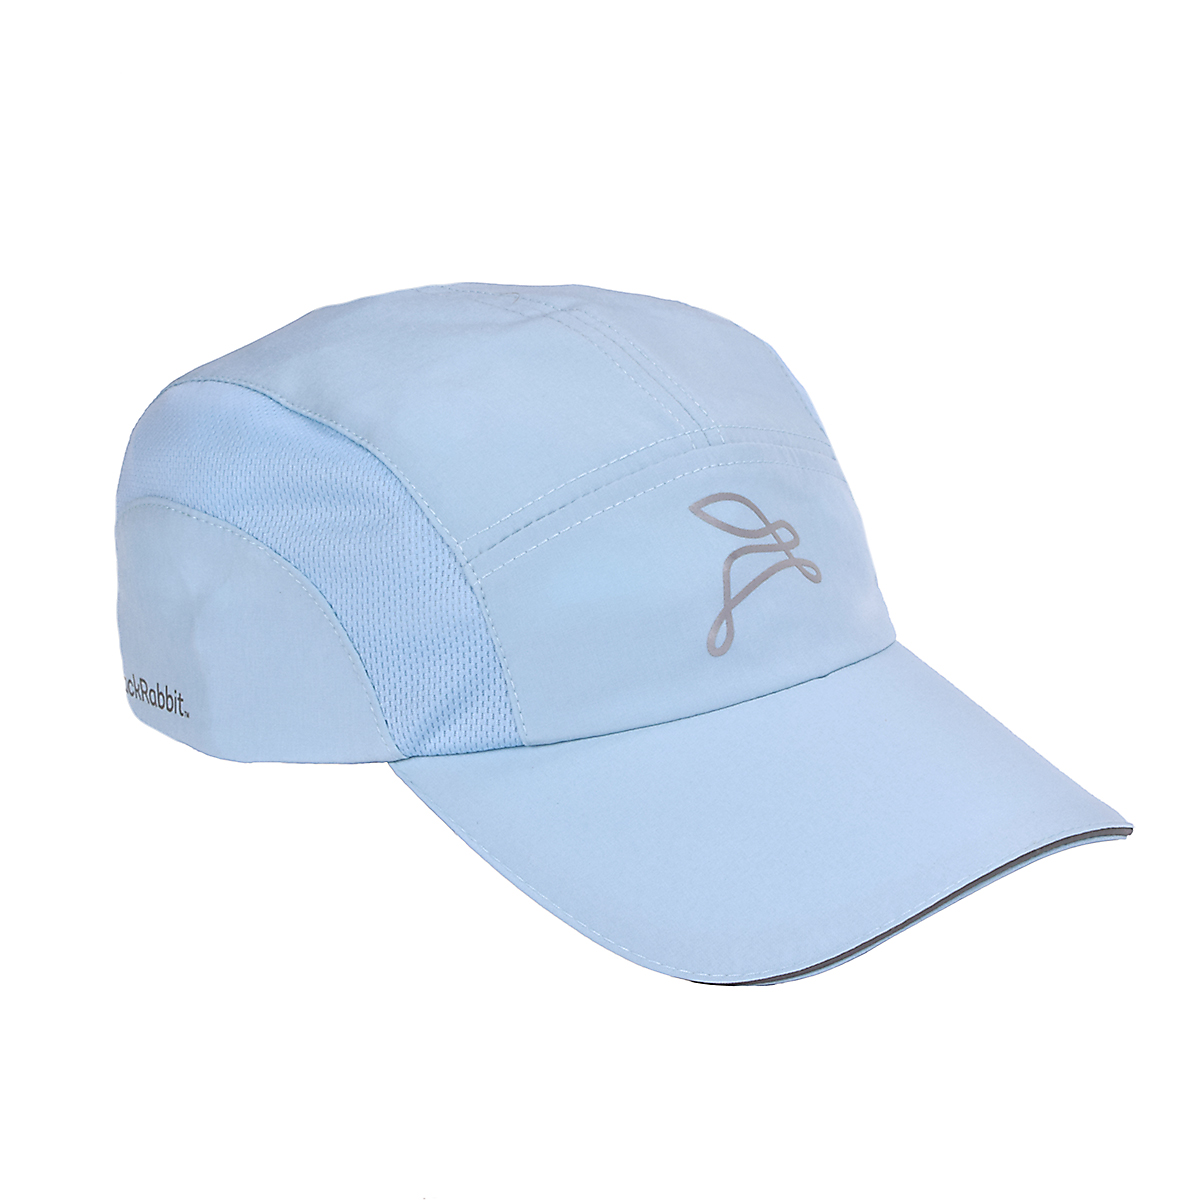 JackRabbit Run Hat - Color: Light Blue - Size: One Size, Light Blue, large, image 1